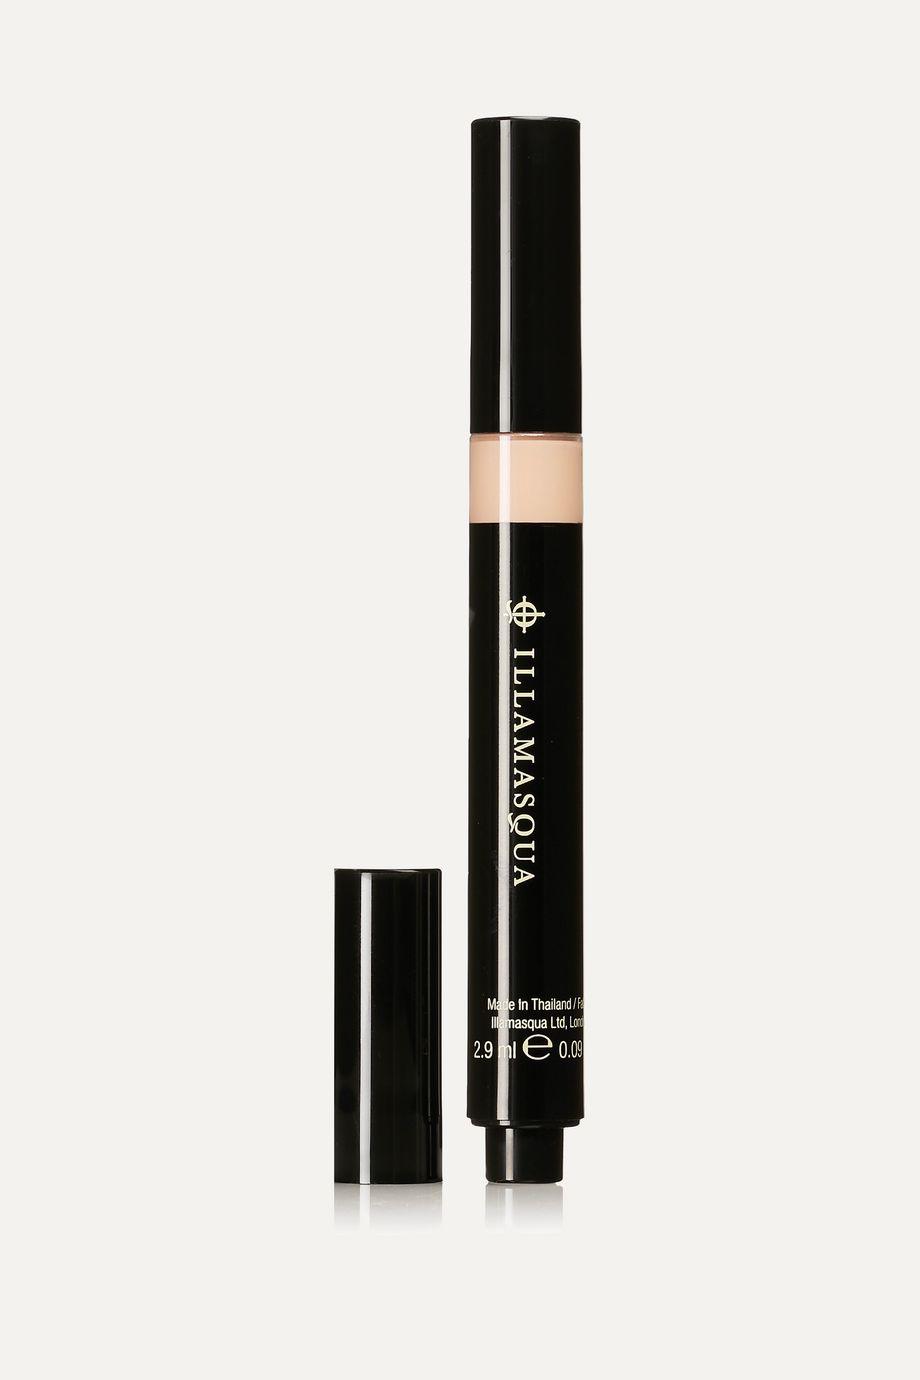 Illamasqua Skin Base Concealer Pen - Light 2